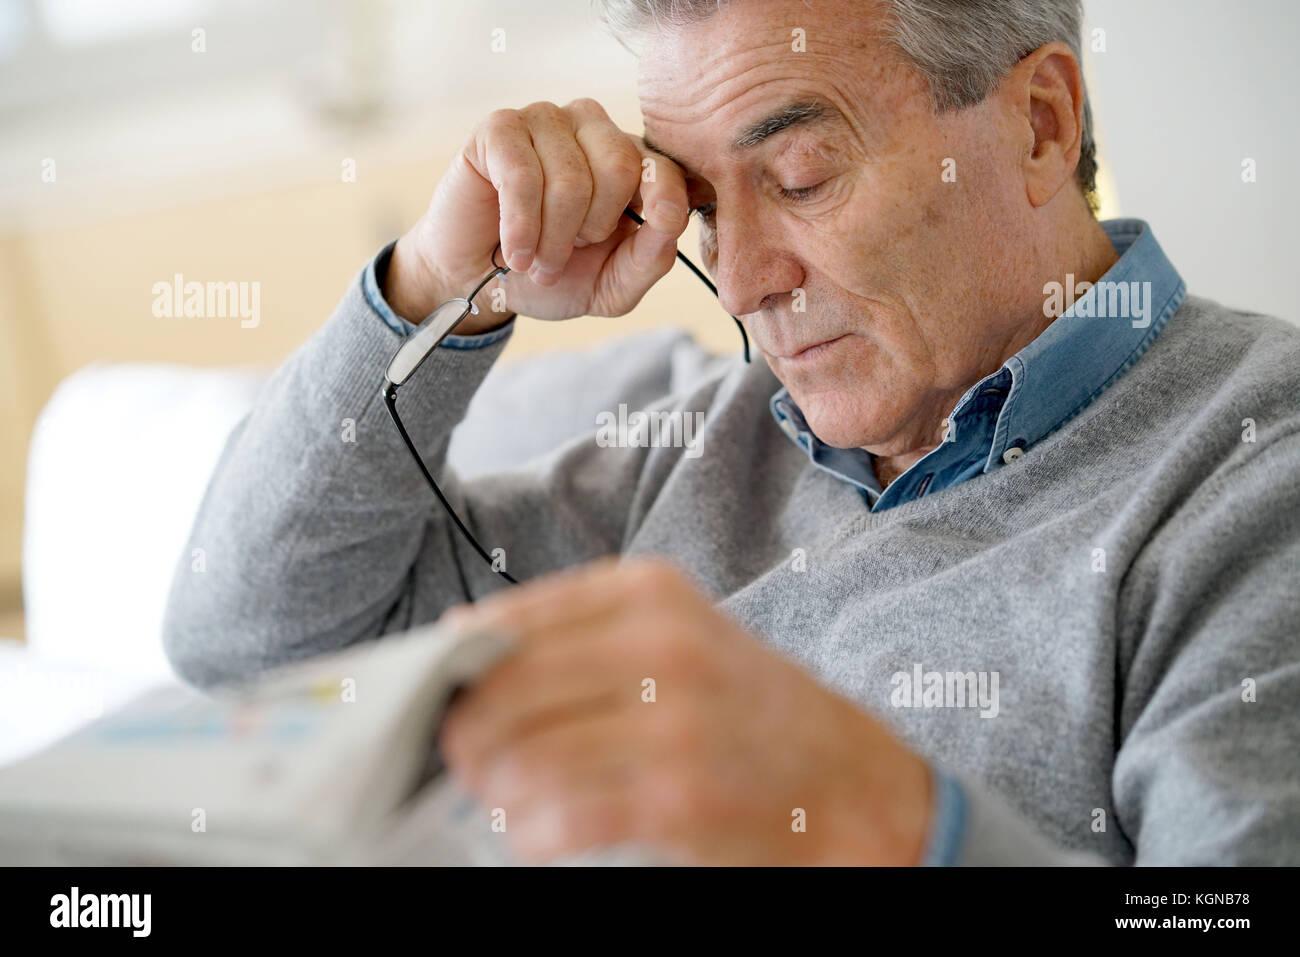 Having a headache senior man reading newspaper Banque D'Images